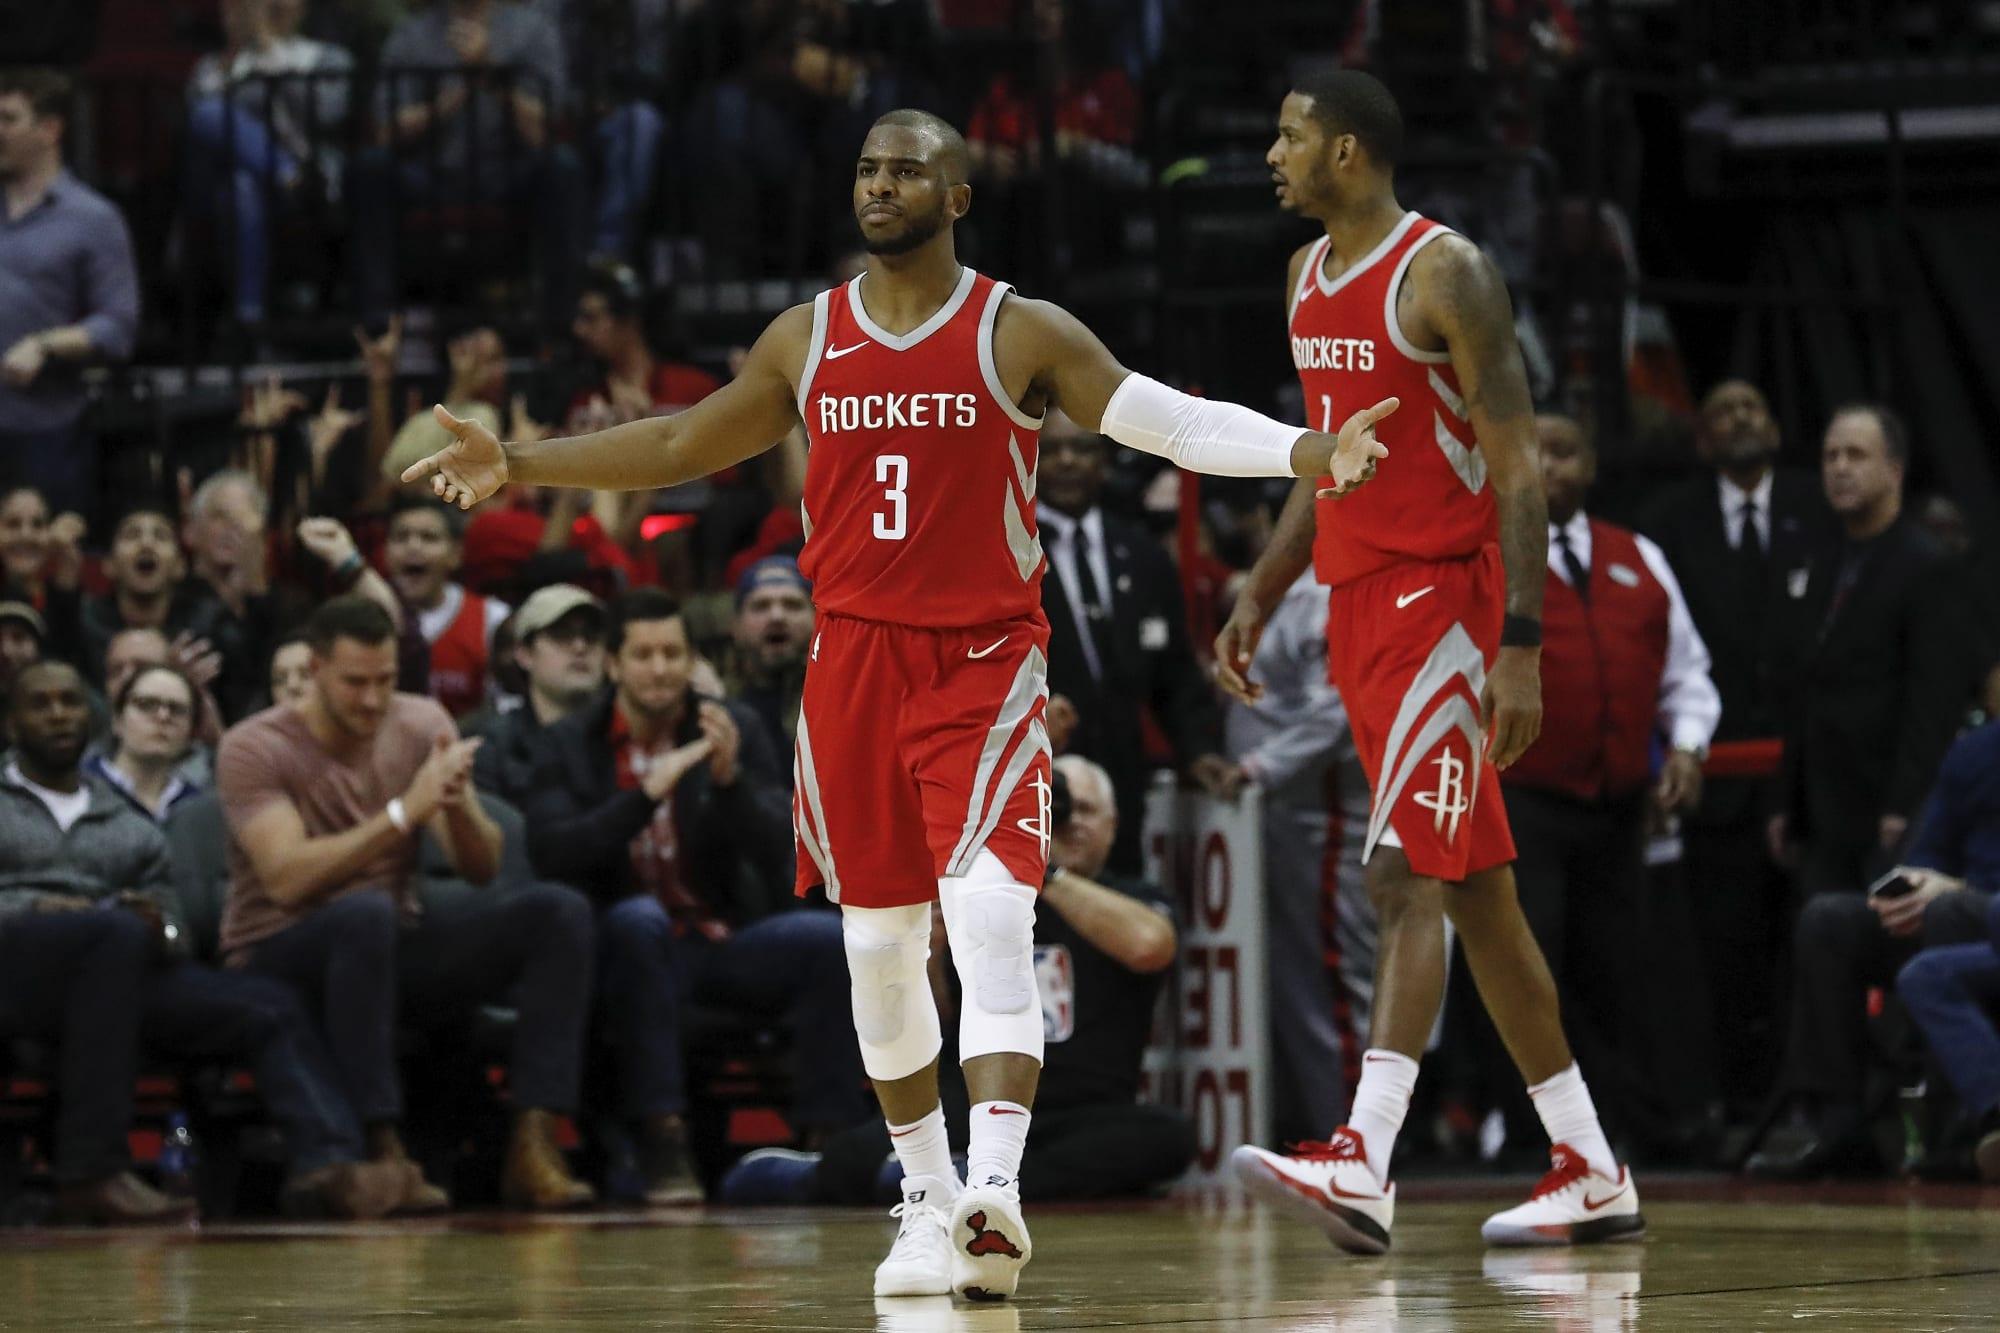 Trevor Ariza praises former Rockets star Chris Paul